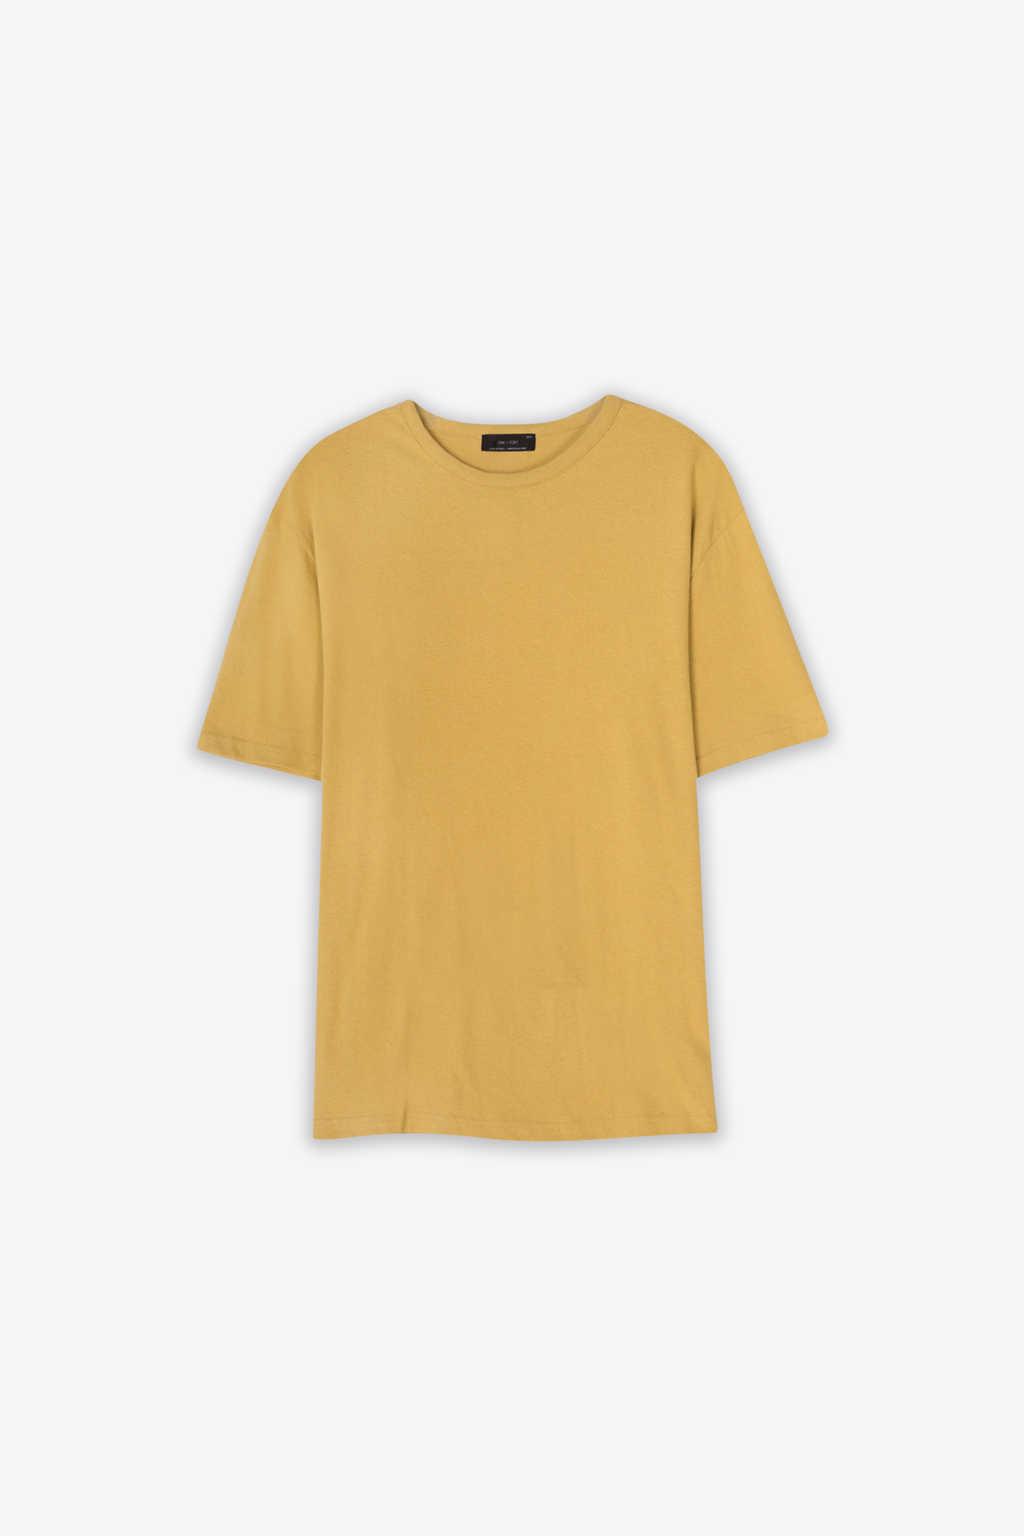 TShirt H134 Yellow 5